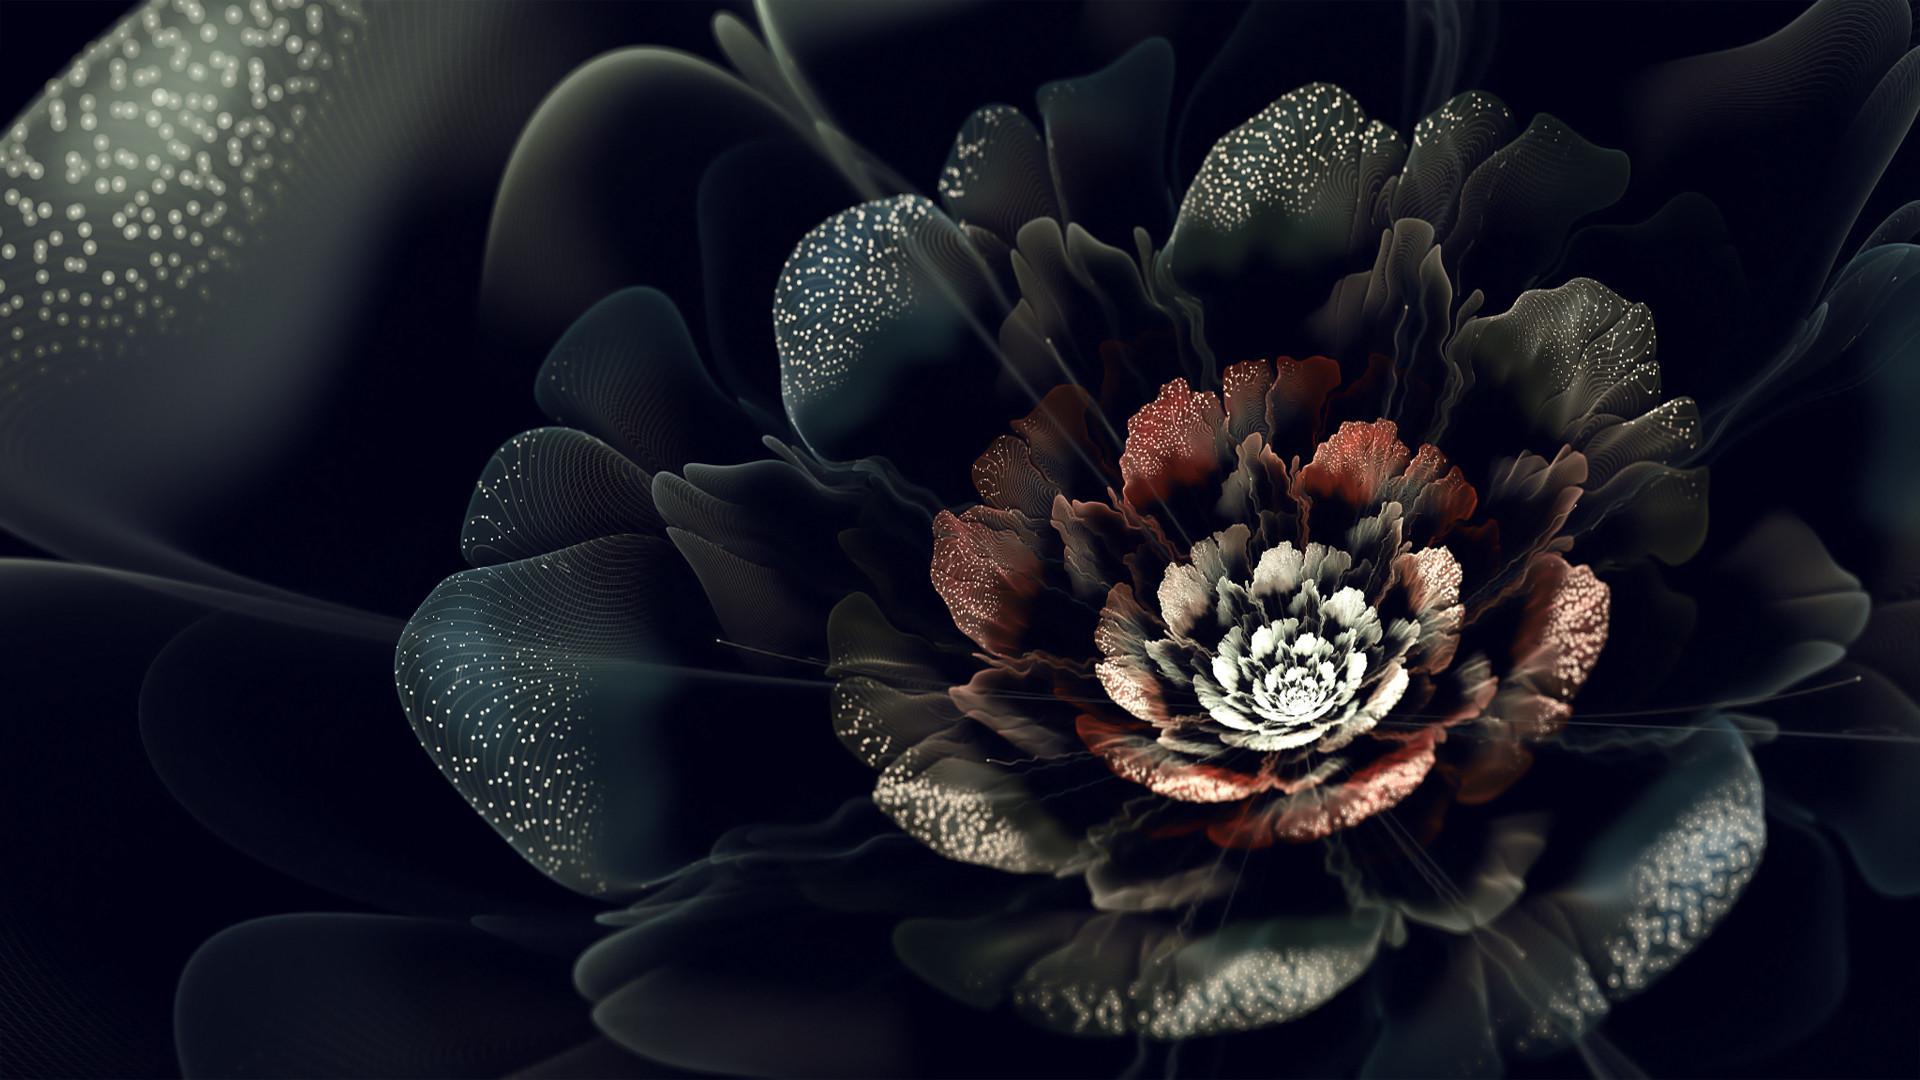 Black Rose Flower Wallpaper Find best latest Black Rose Flower Wallpaper  for your PC desktop background